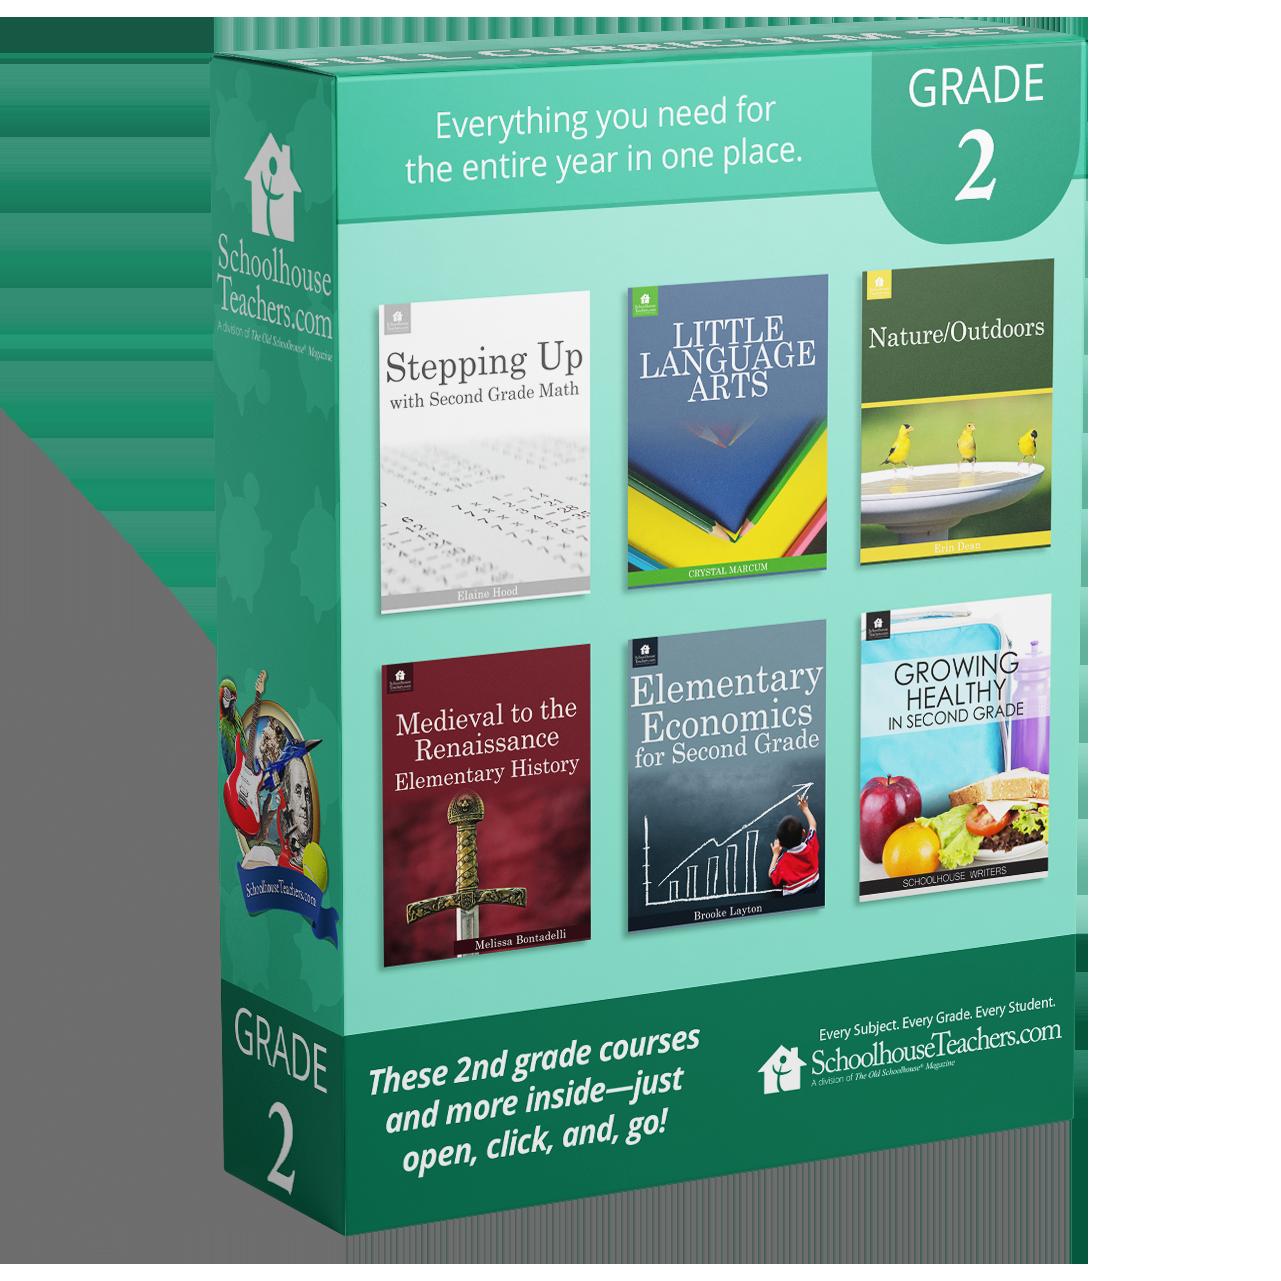 Grade 2 School Box - Back